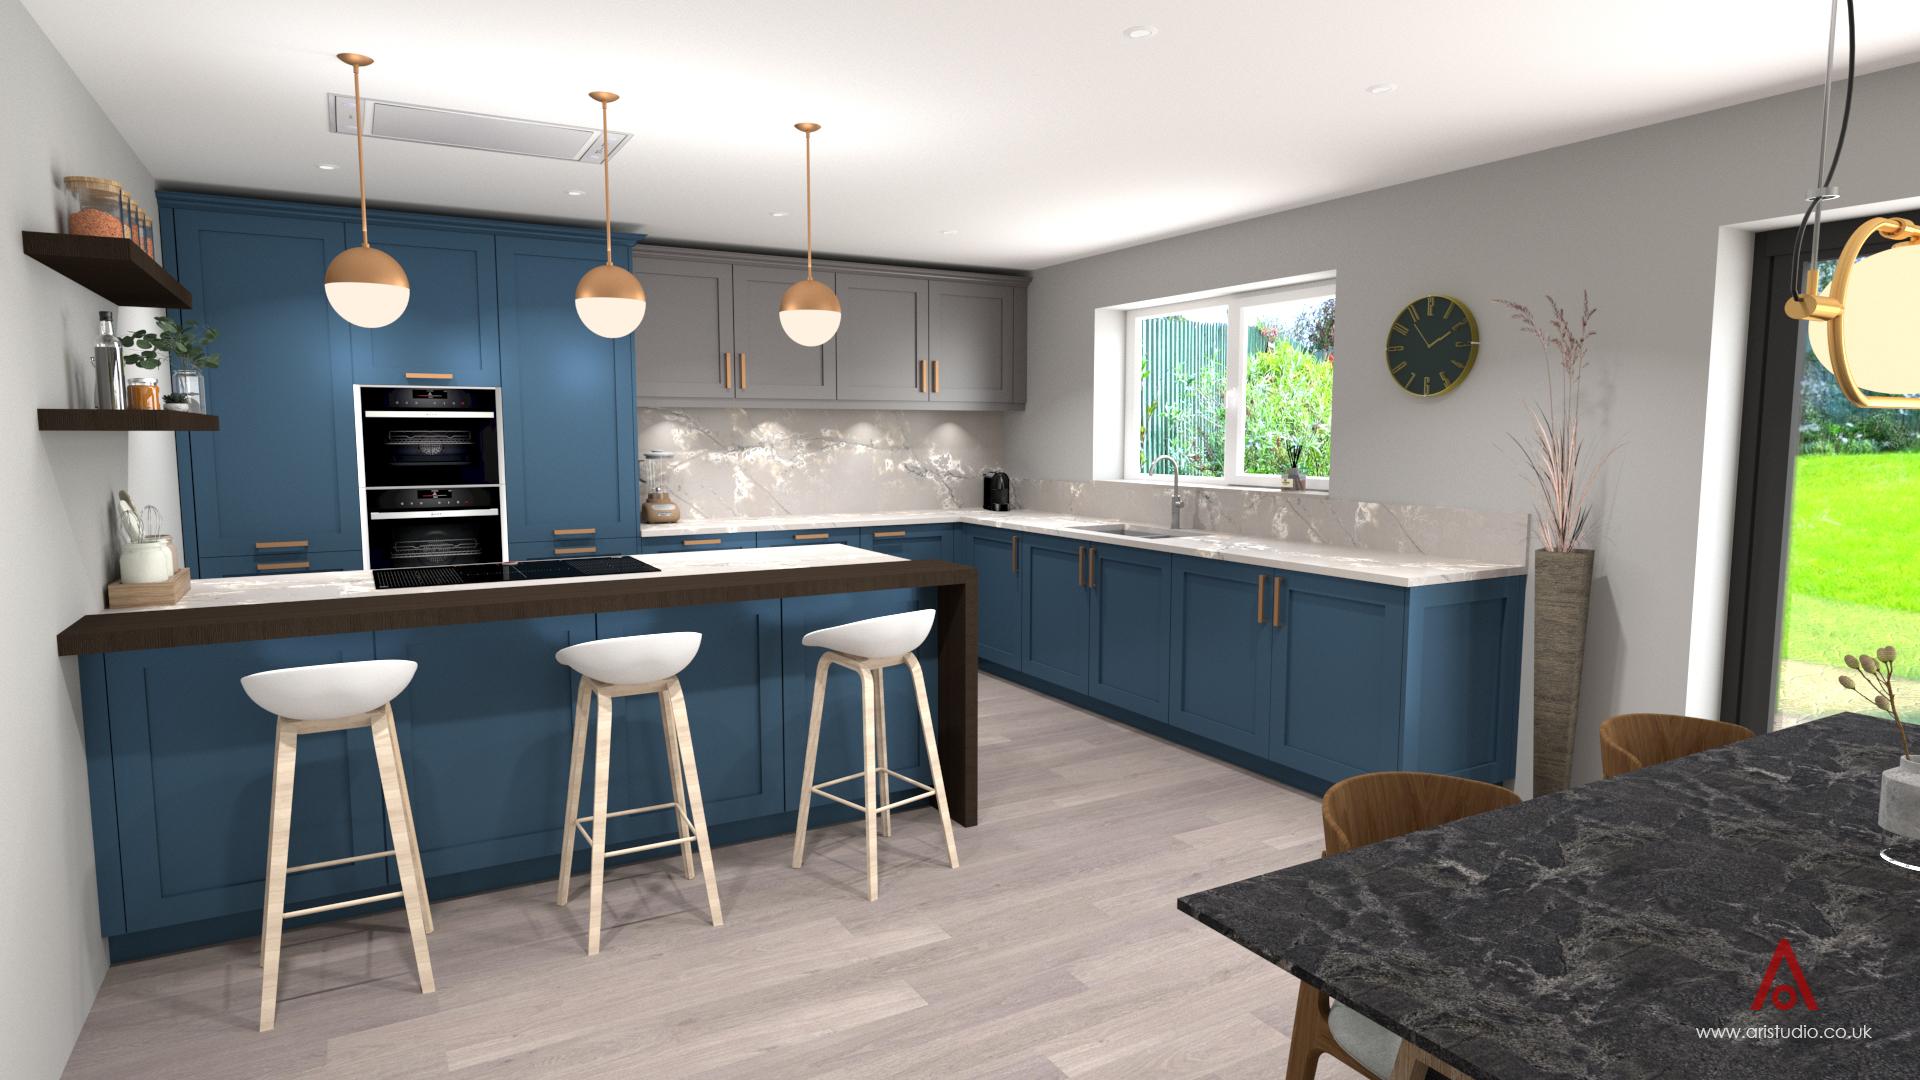 Kitchen design by Ari Studio